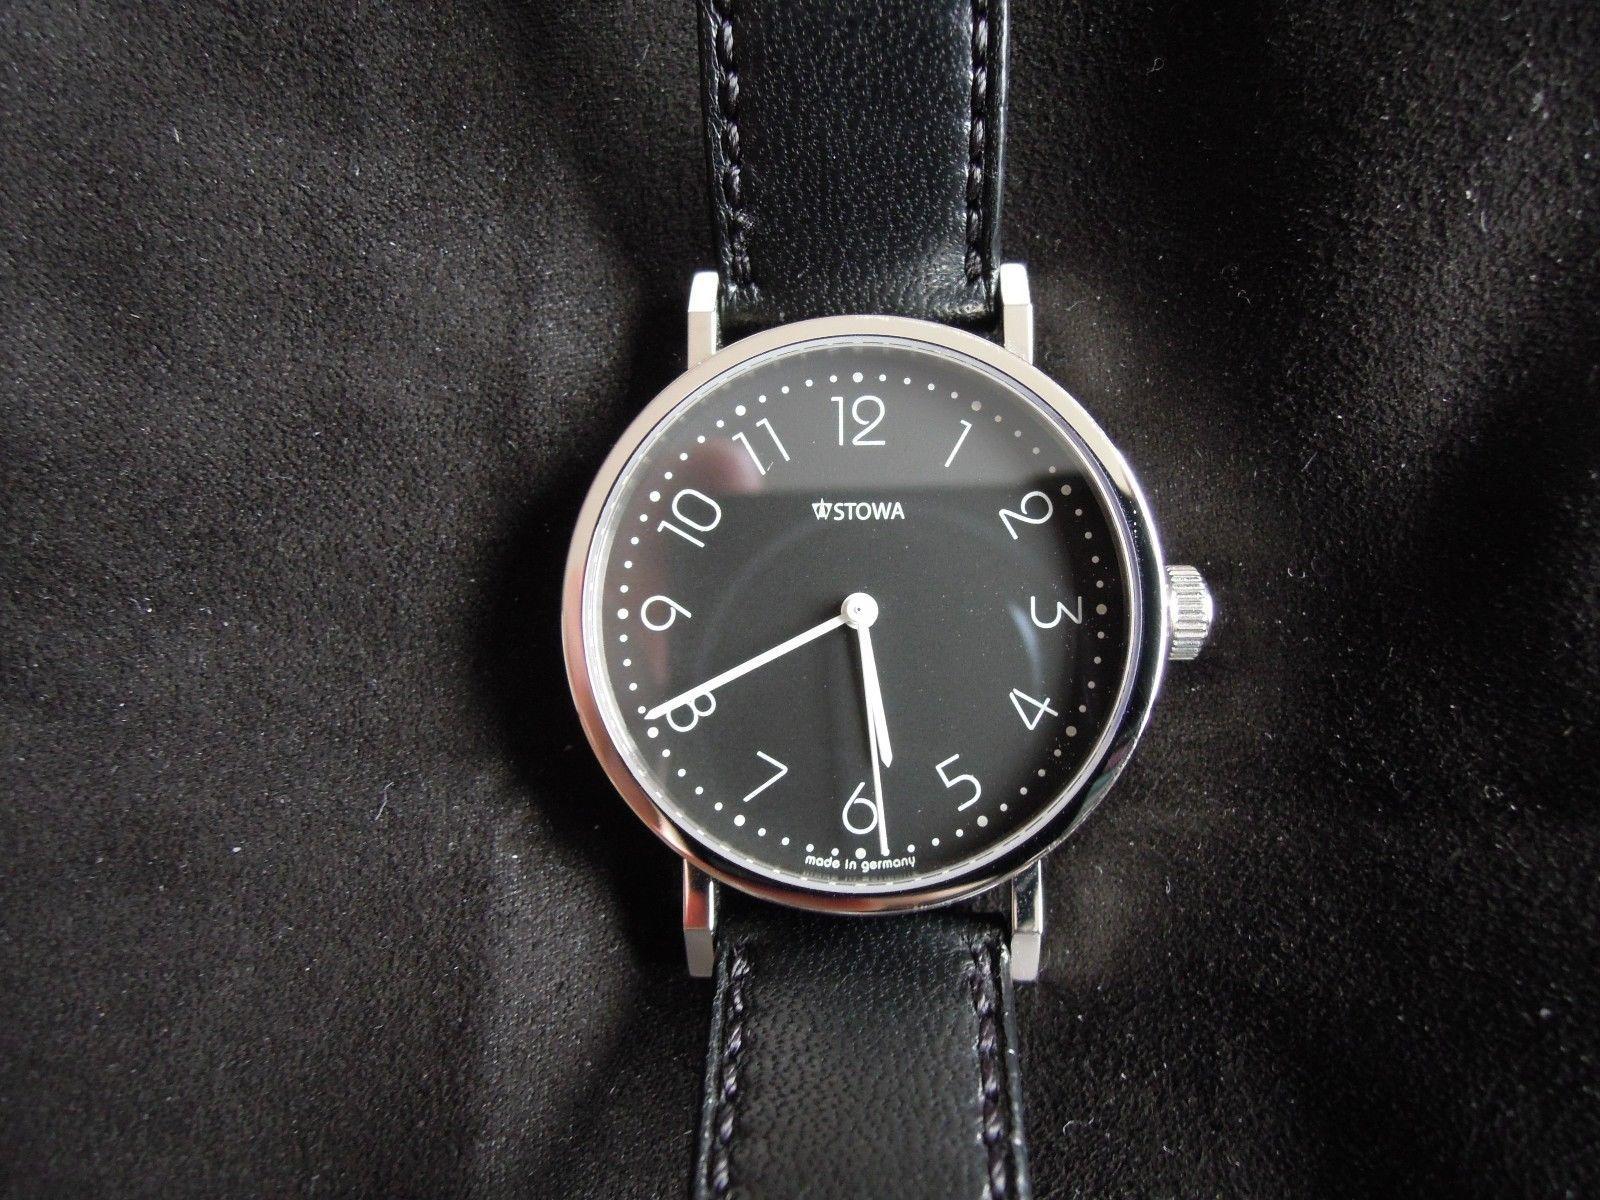 Stowa Antea back to Bauhaus Watch - Top Grade Movement.  9f8504eaff4